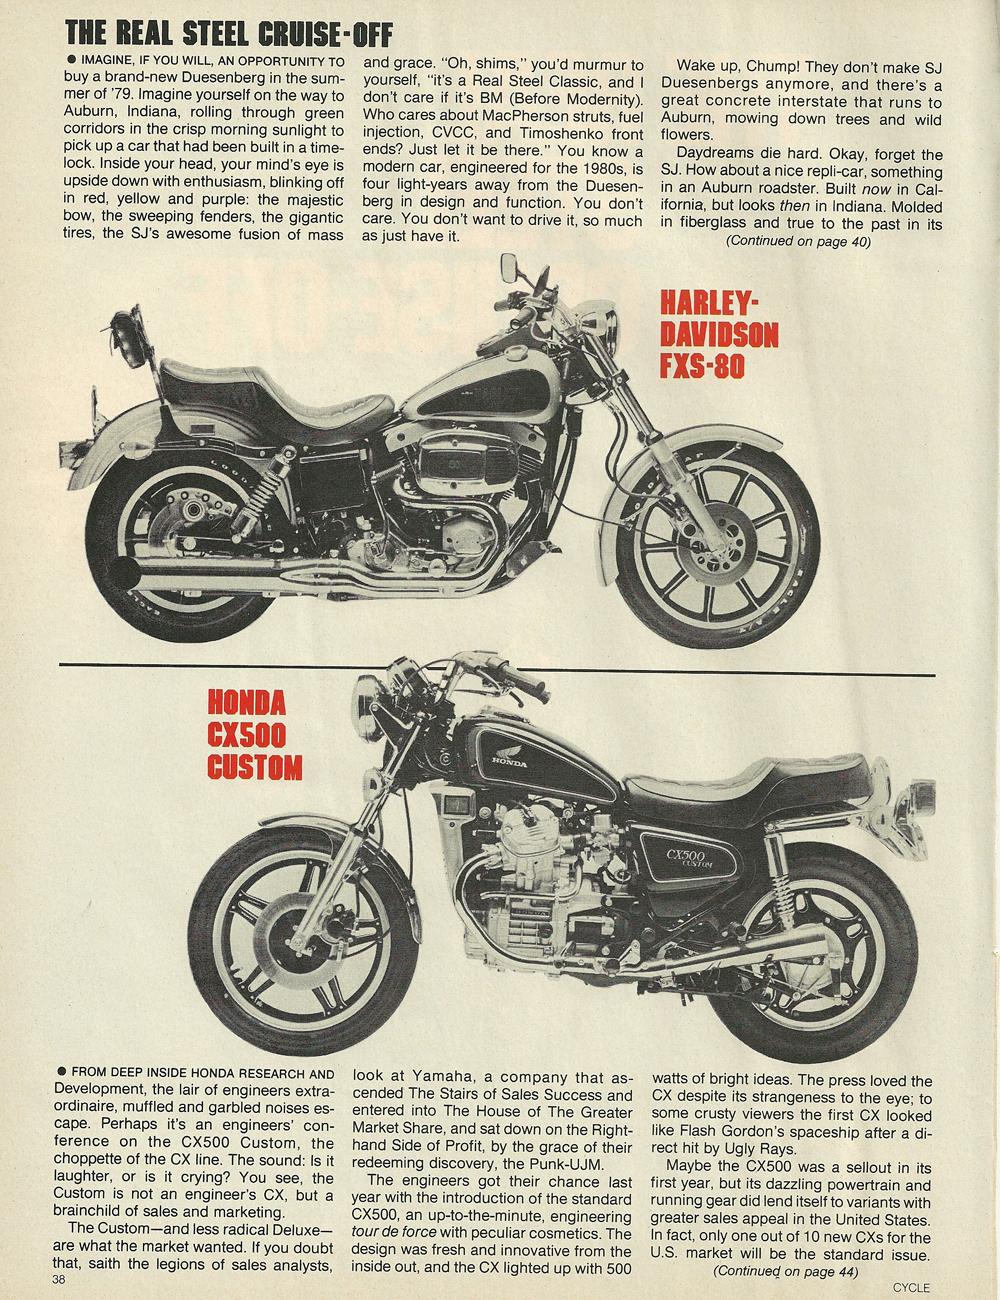 1979 Honda CX500 vs Harley FXS-80 Lowrider 2.jpg